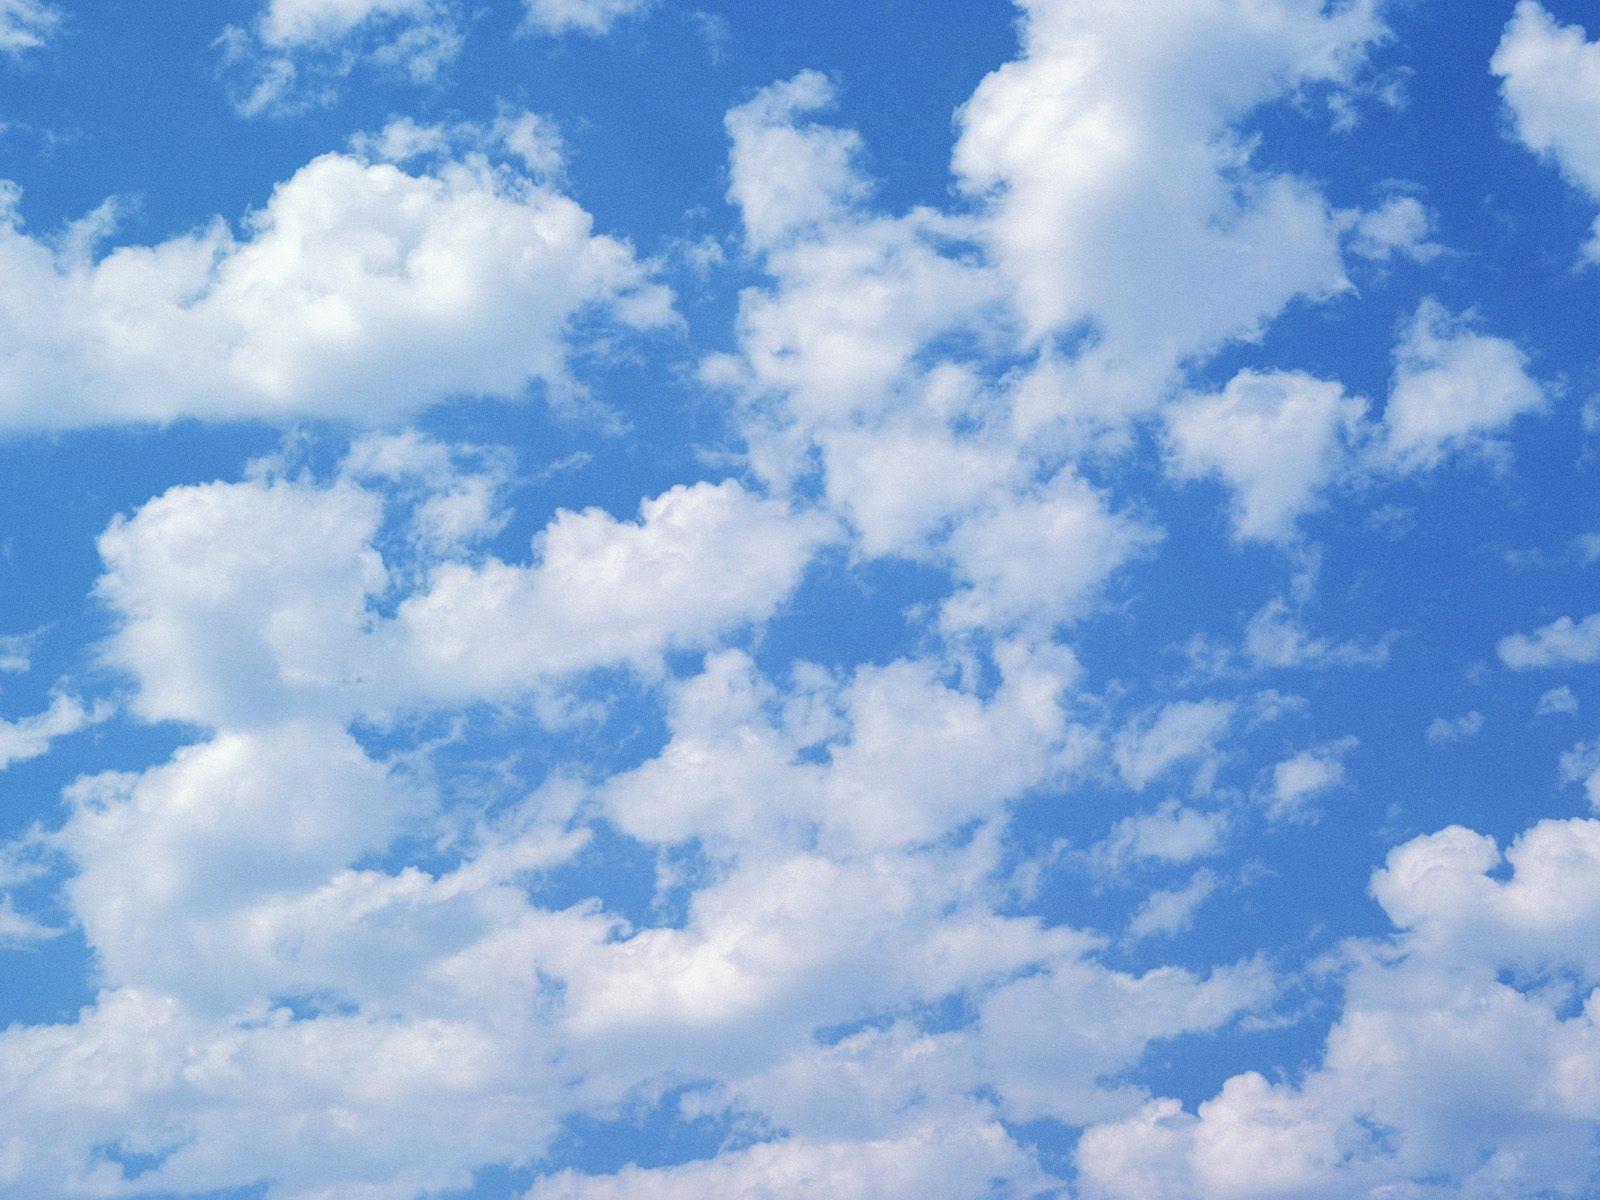 clouds wallpaper 1080p